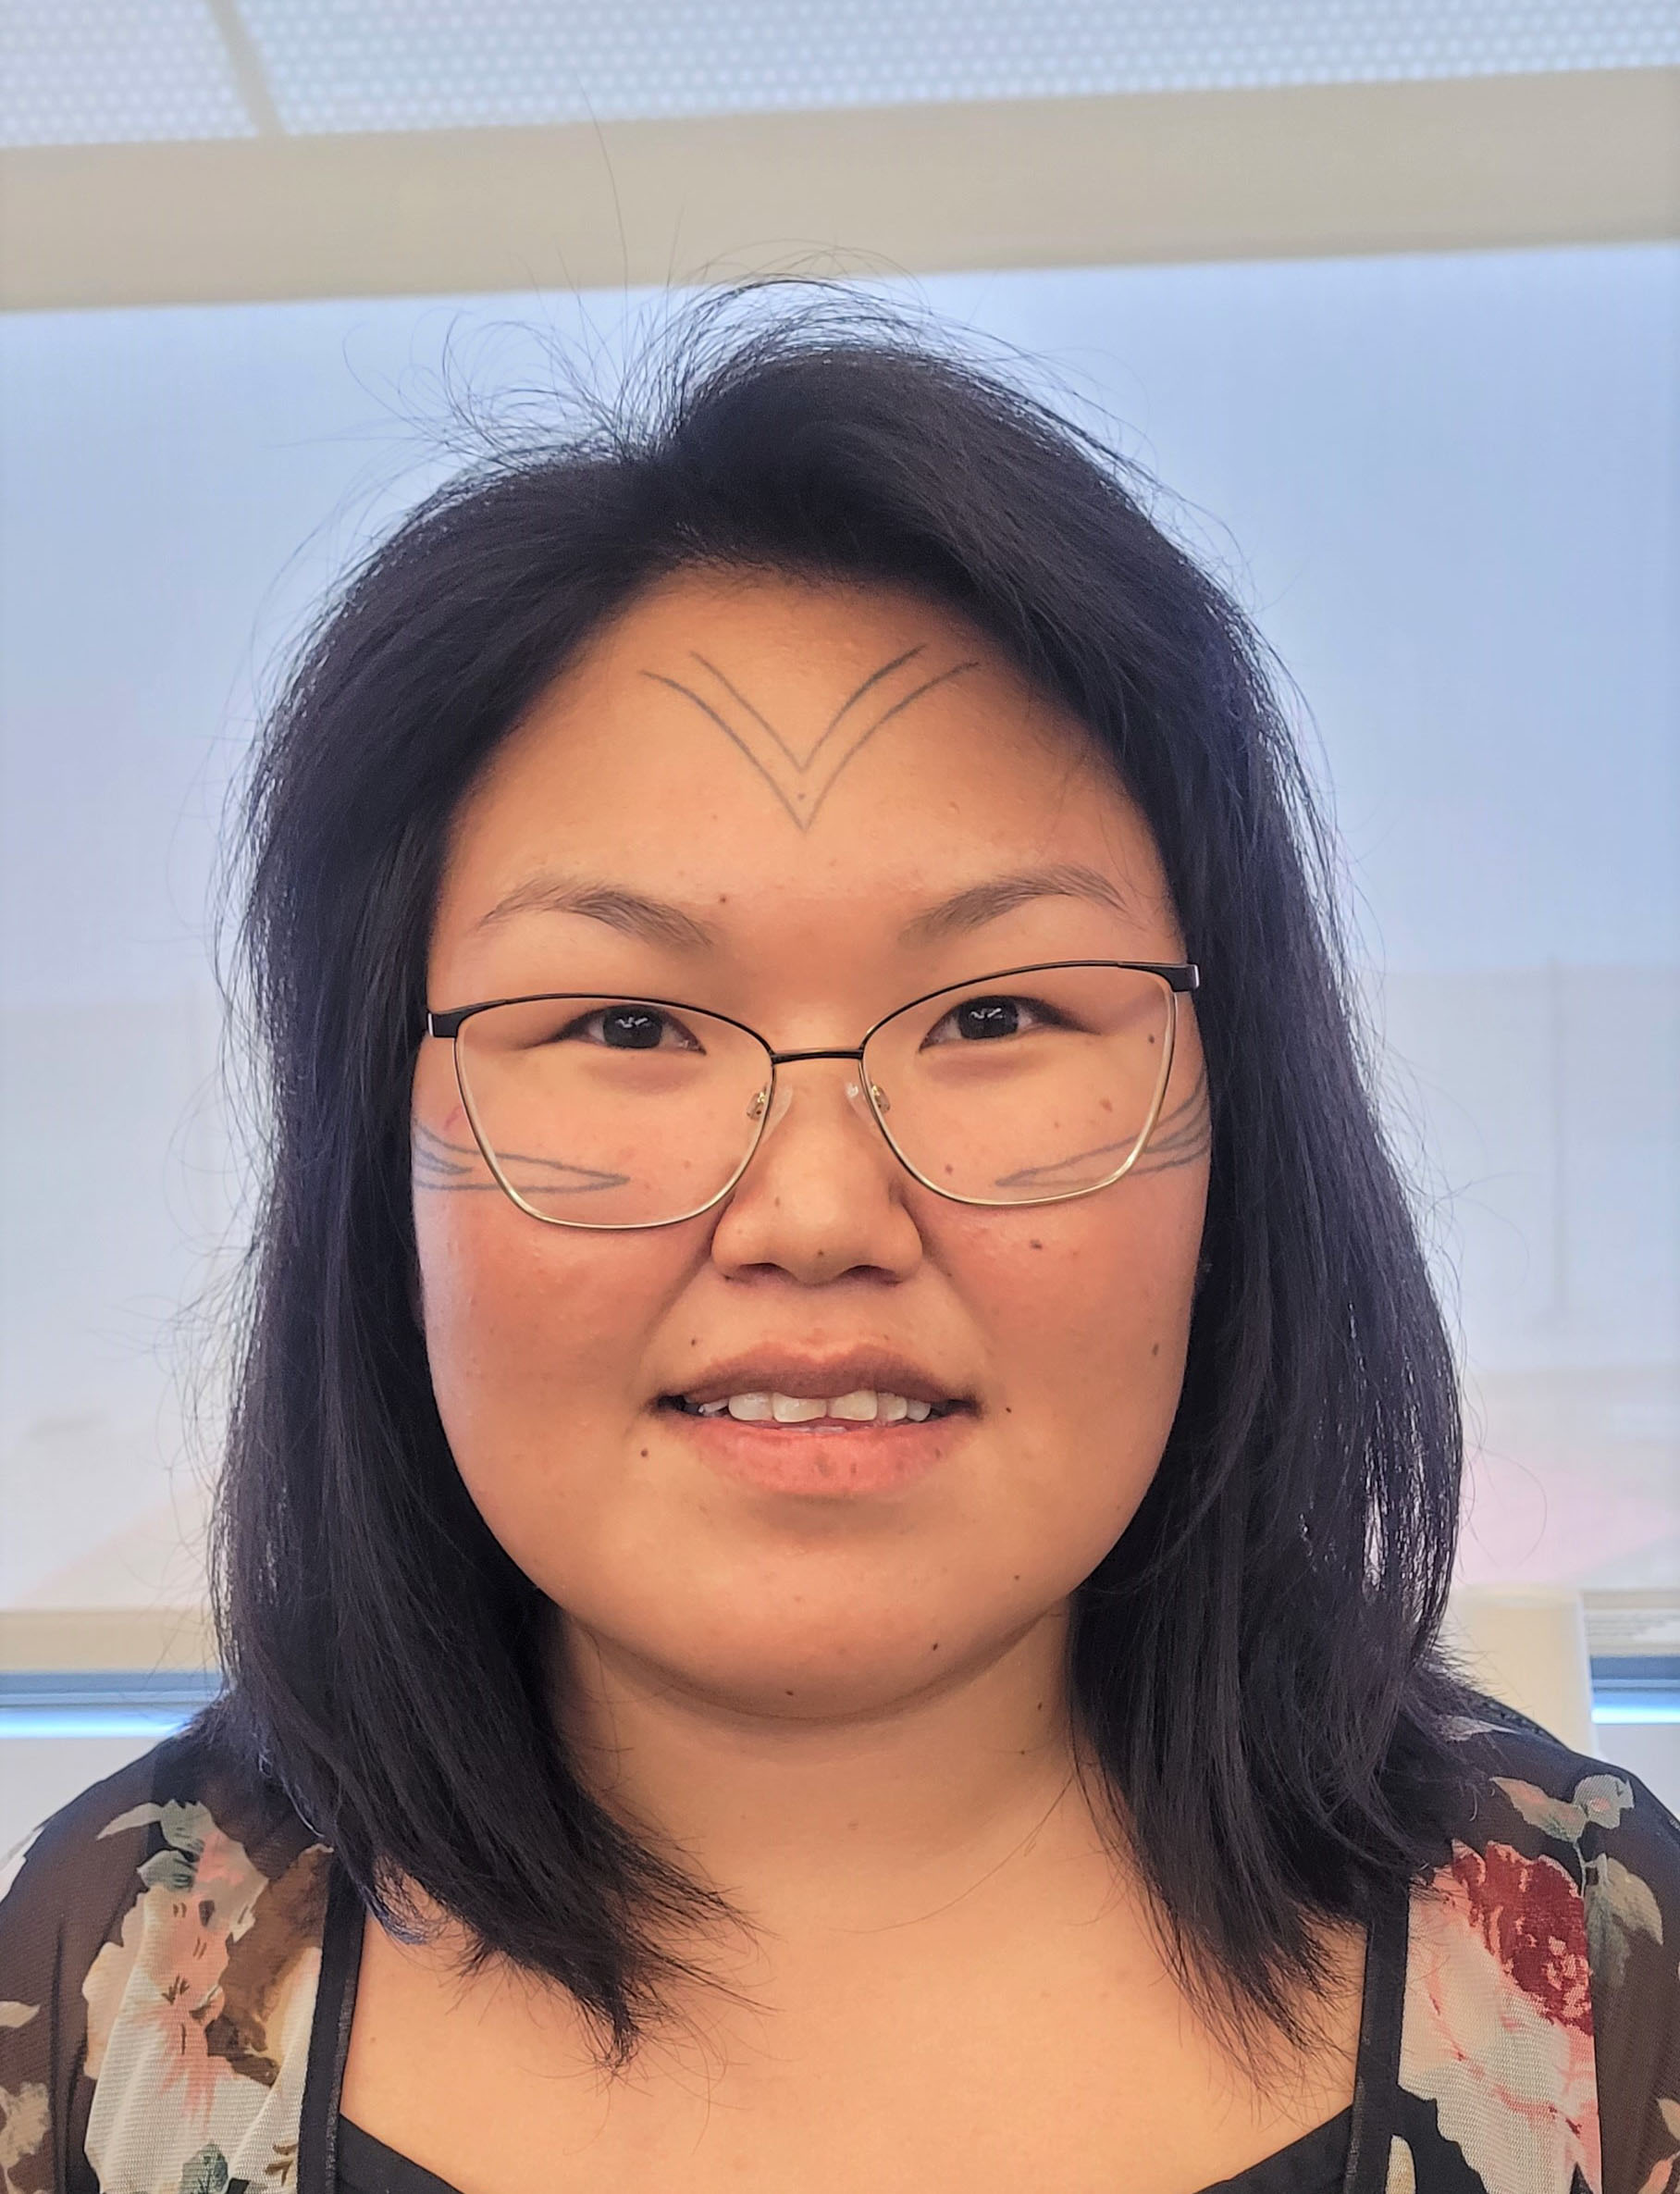 Tanya Ongahak